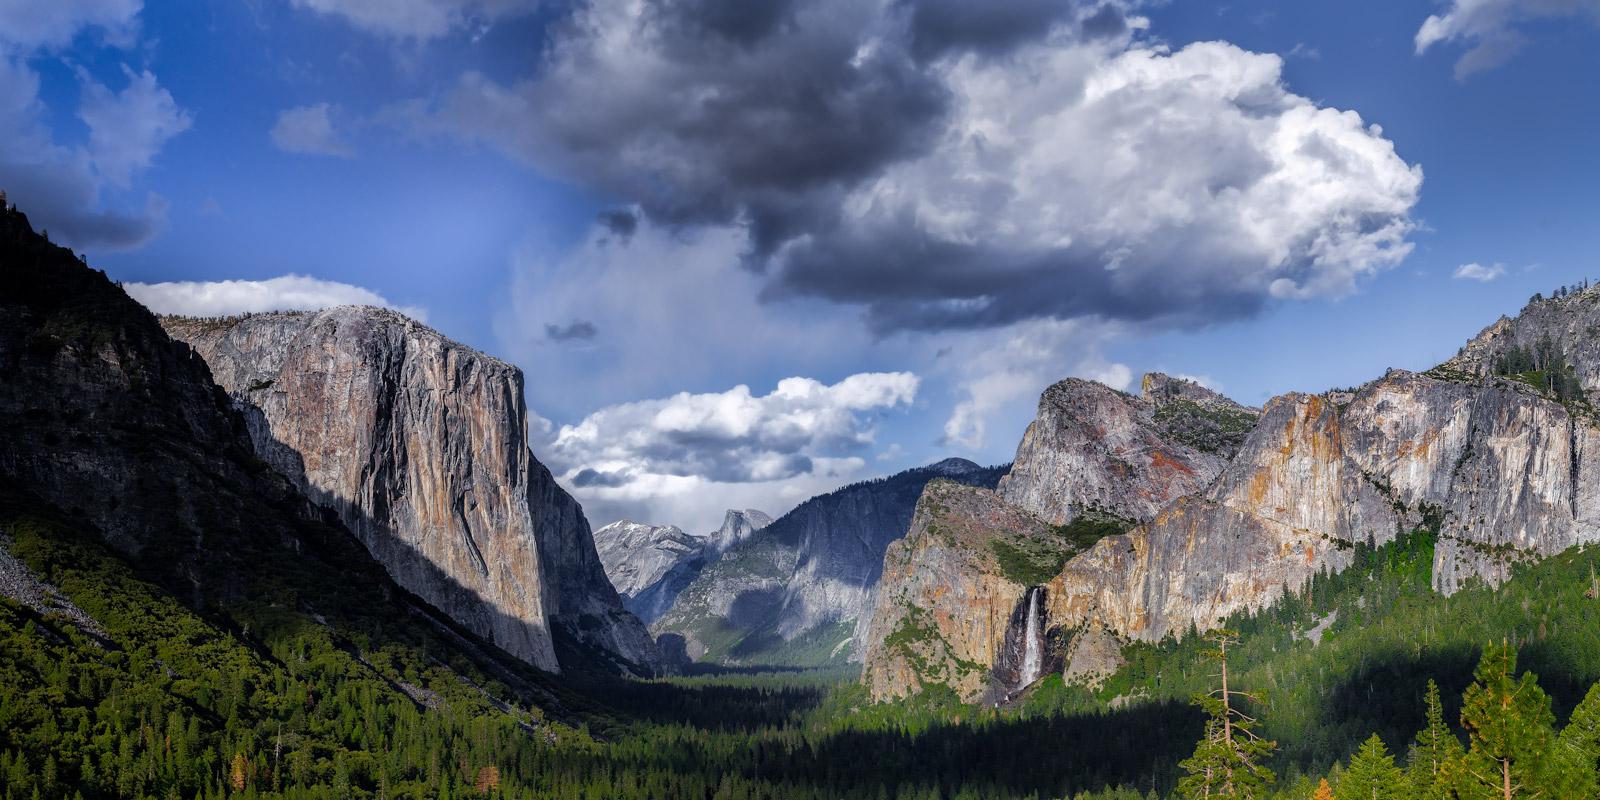 California, Yosemite, Valley, Half Dome, El Capitan, Bridalveil, Falls, limited edition, photograph, fine art, landscape, photo